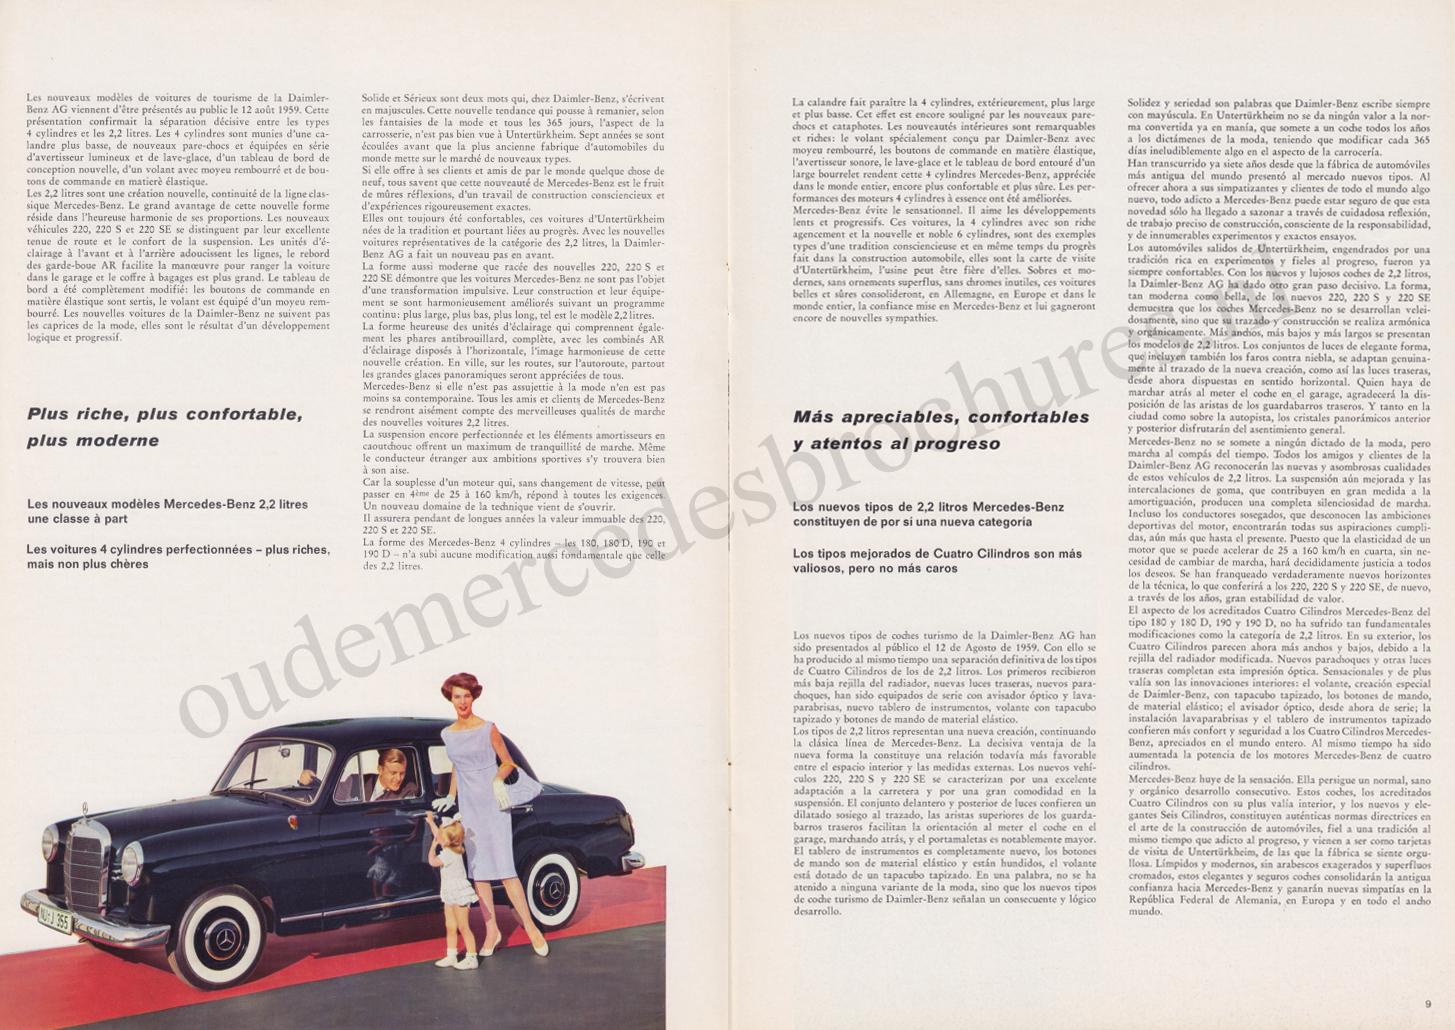 (REVISTA): Periódico In aller welt n.º 34 - Mercedes-Benz no mundo - 1959 - multilingue 005